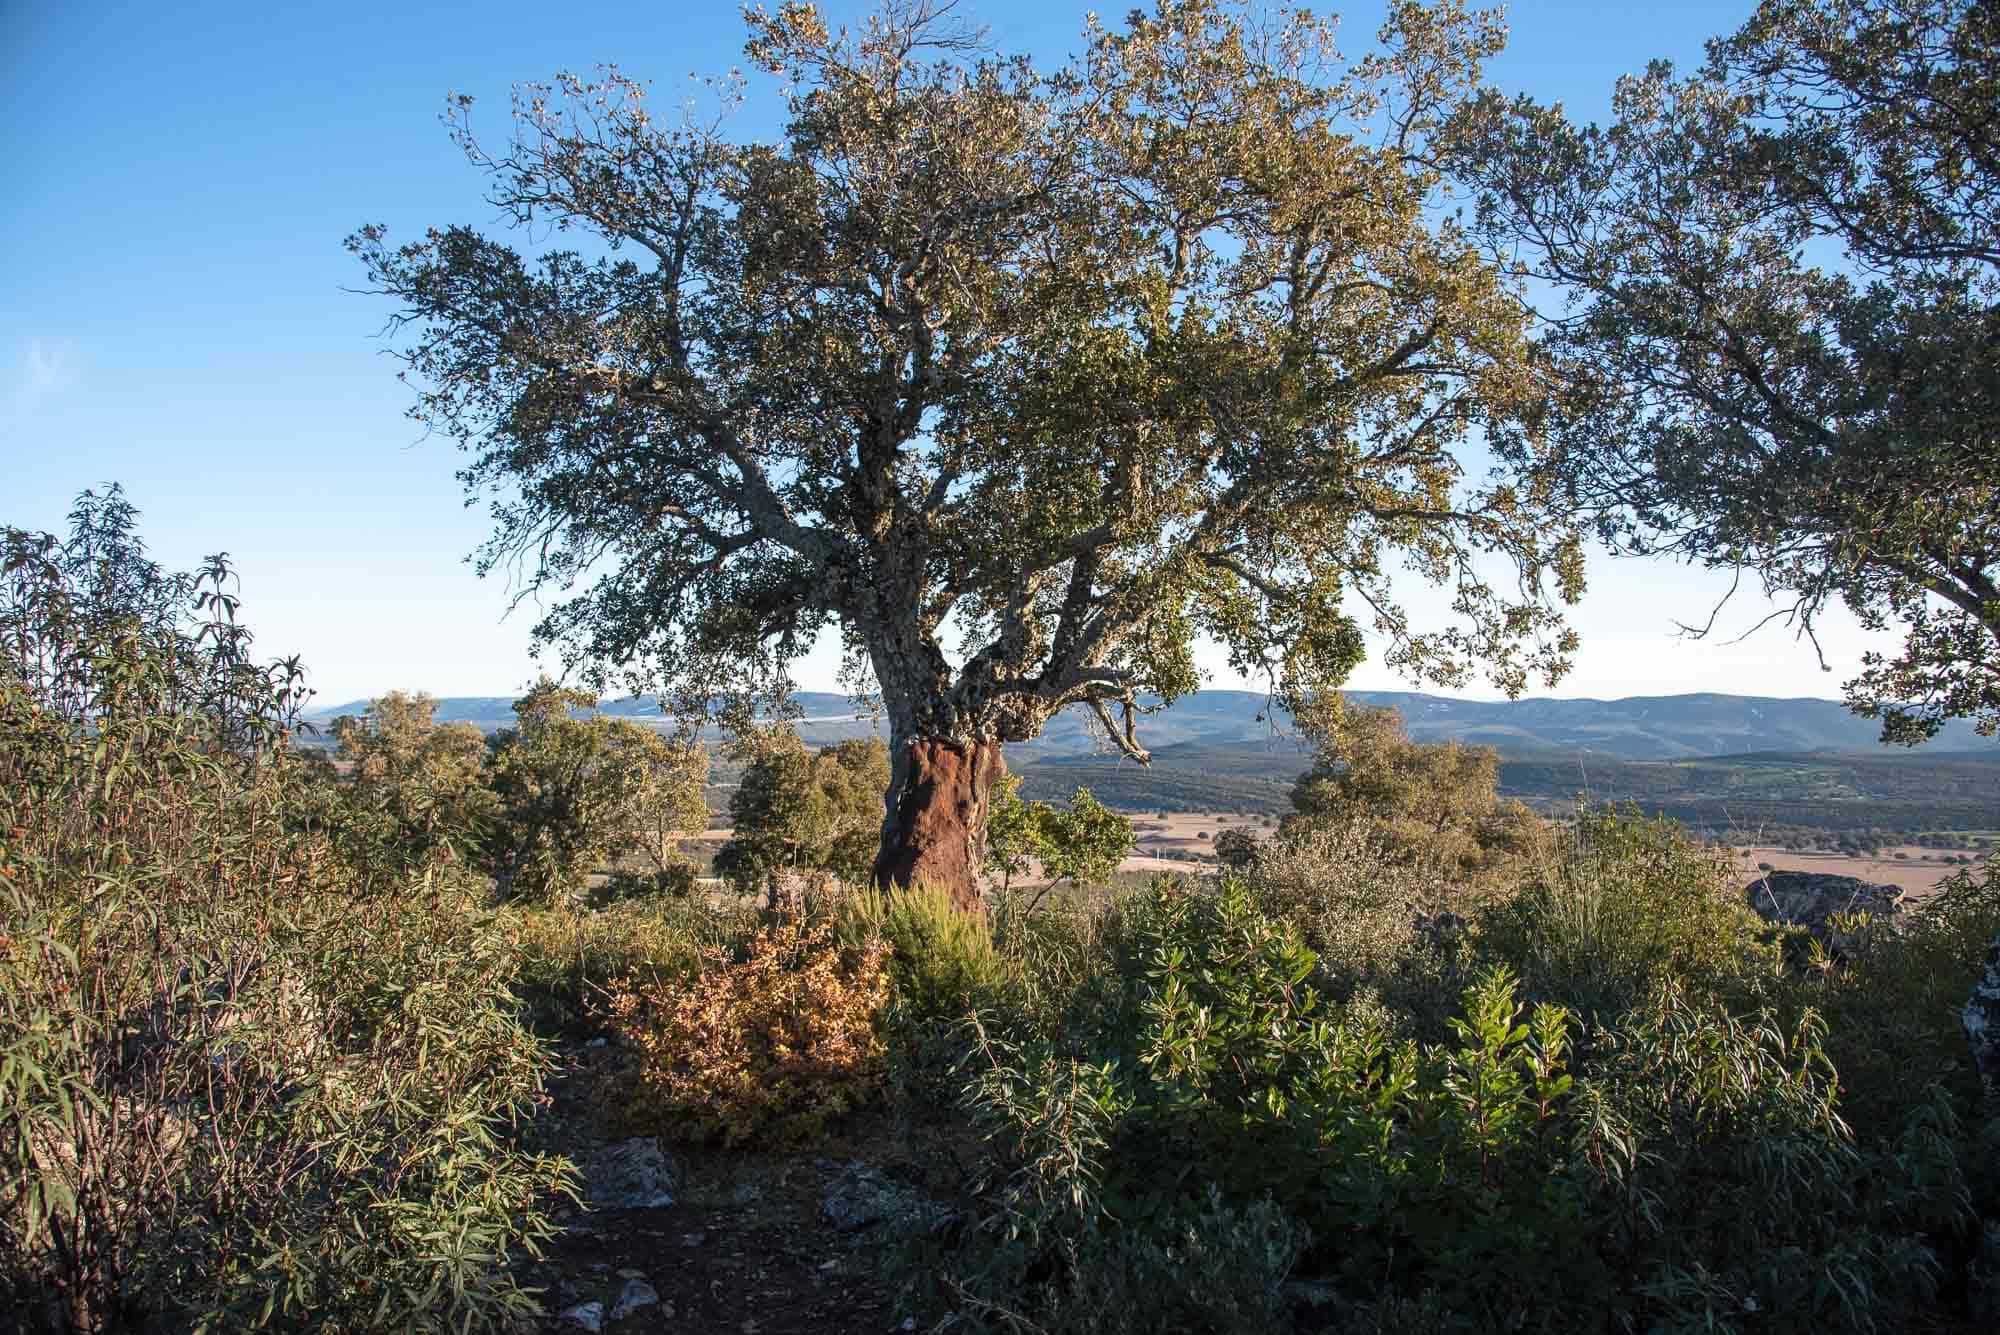 Alcornoque Quercus suber plaza de los moros